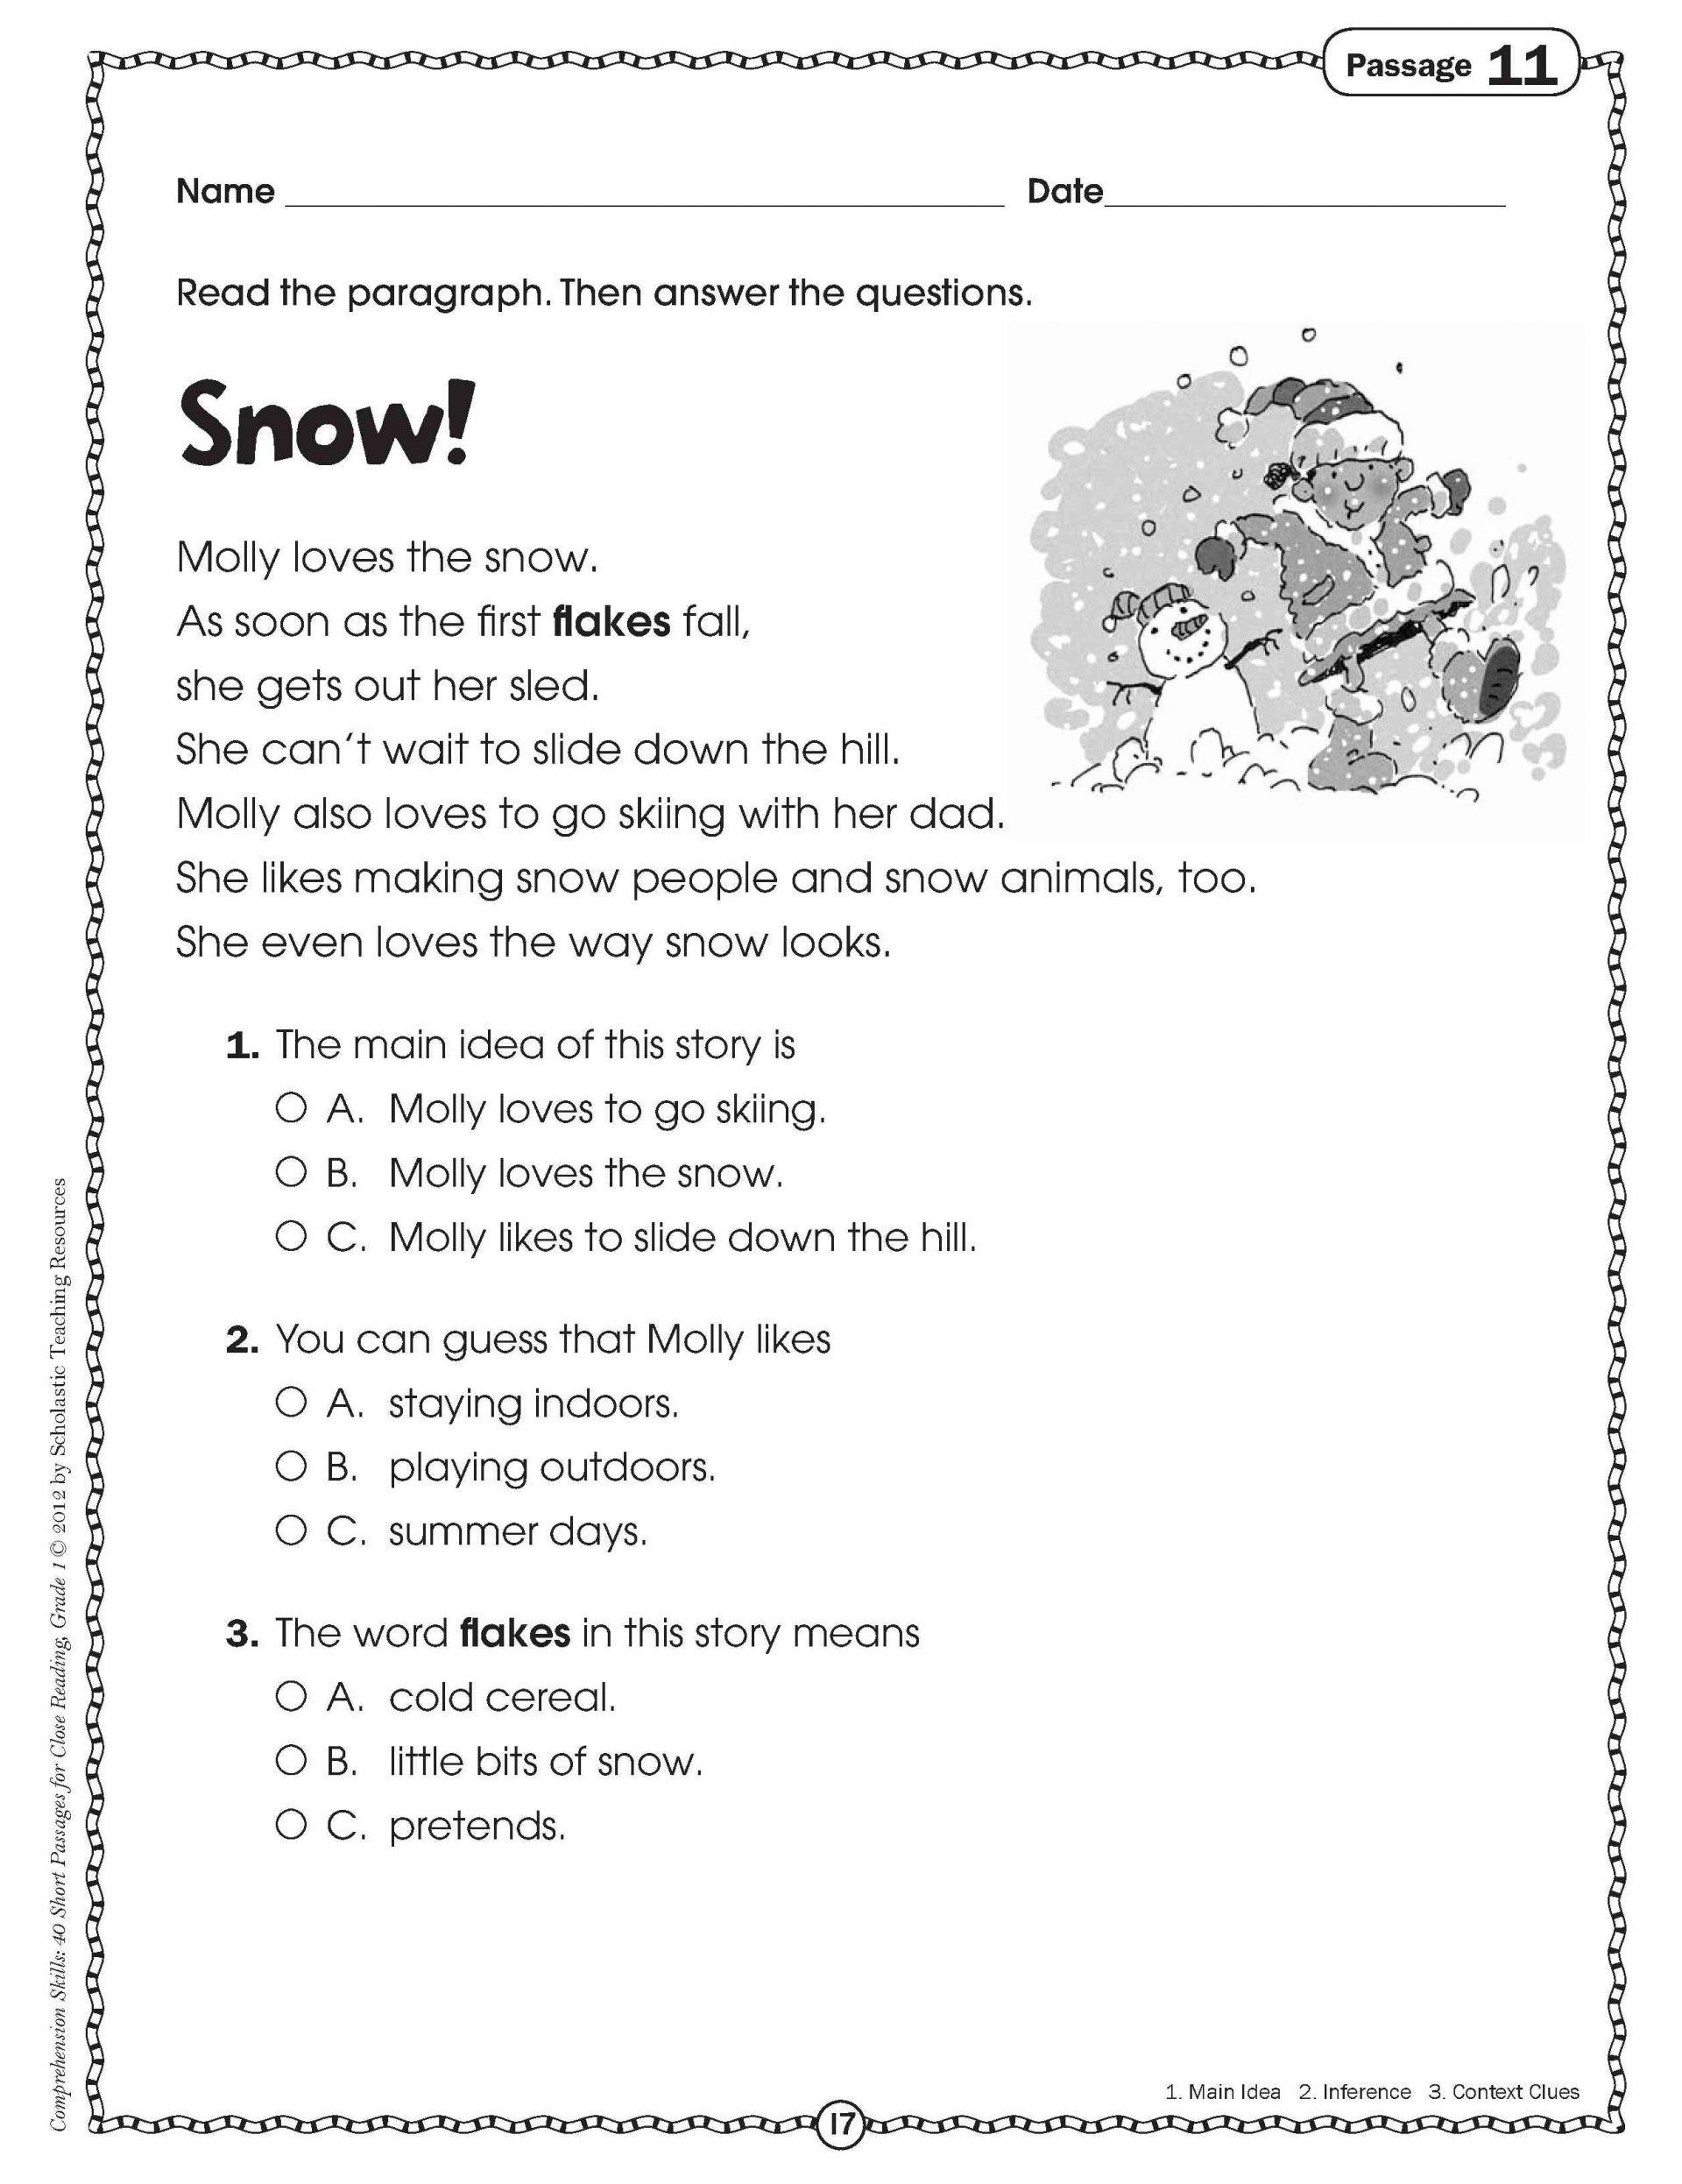 Free Printable Reading Comprehension Worksheets 3Rd Grade To - Free | Free Printable Grade 1 Reading Comprehension Worksheets